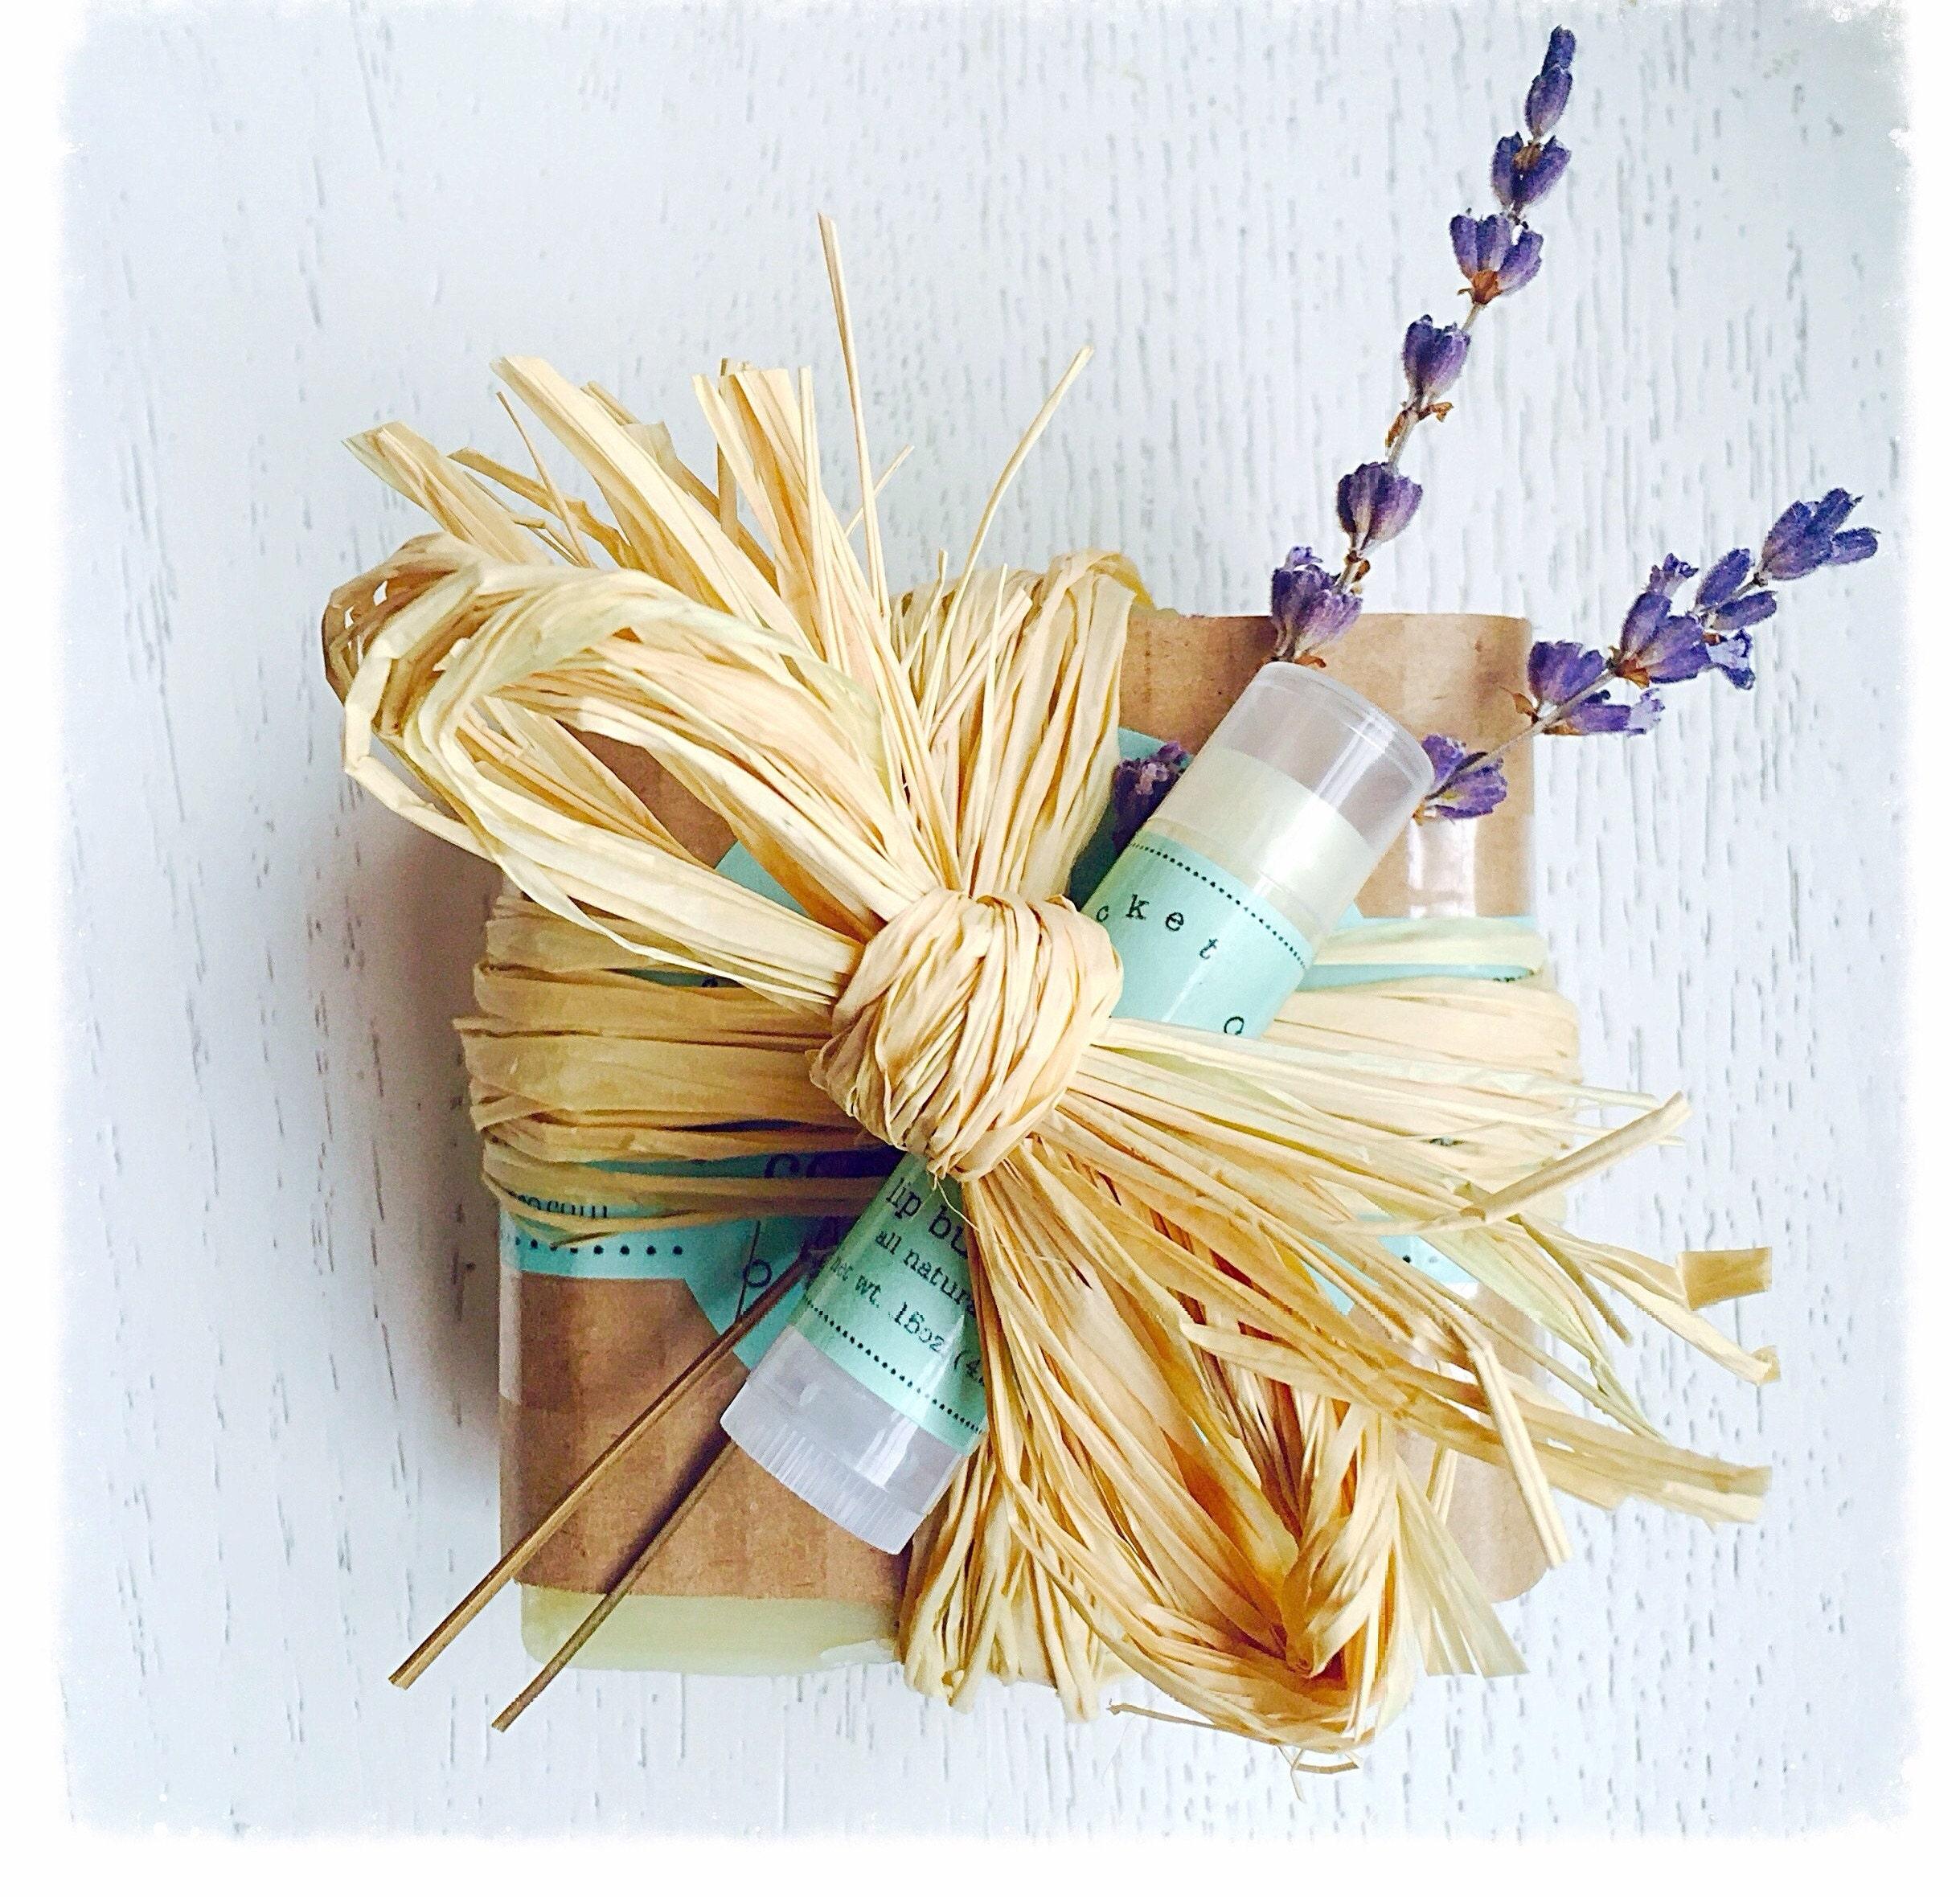 Lavender Soap Set Gift For Her Handmade Soap Hostess Gift Holiday Gift Idea Teacher Gift Gift Set Soap Set Valentines Day